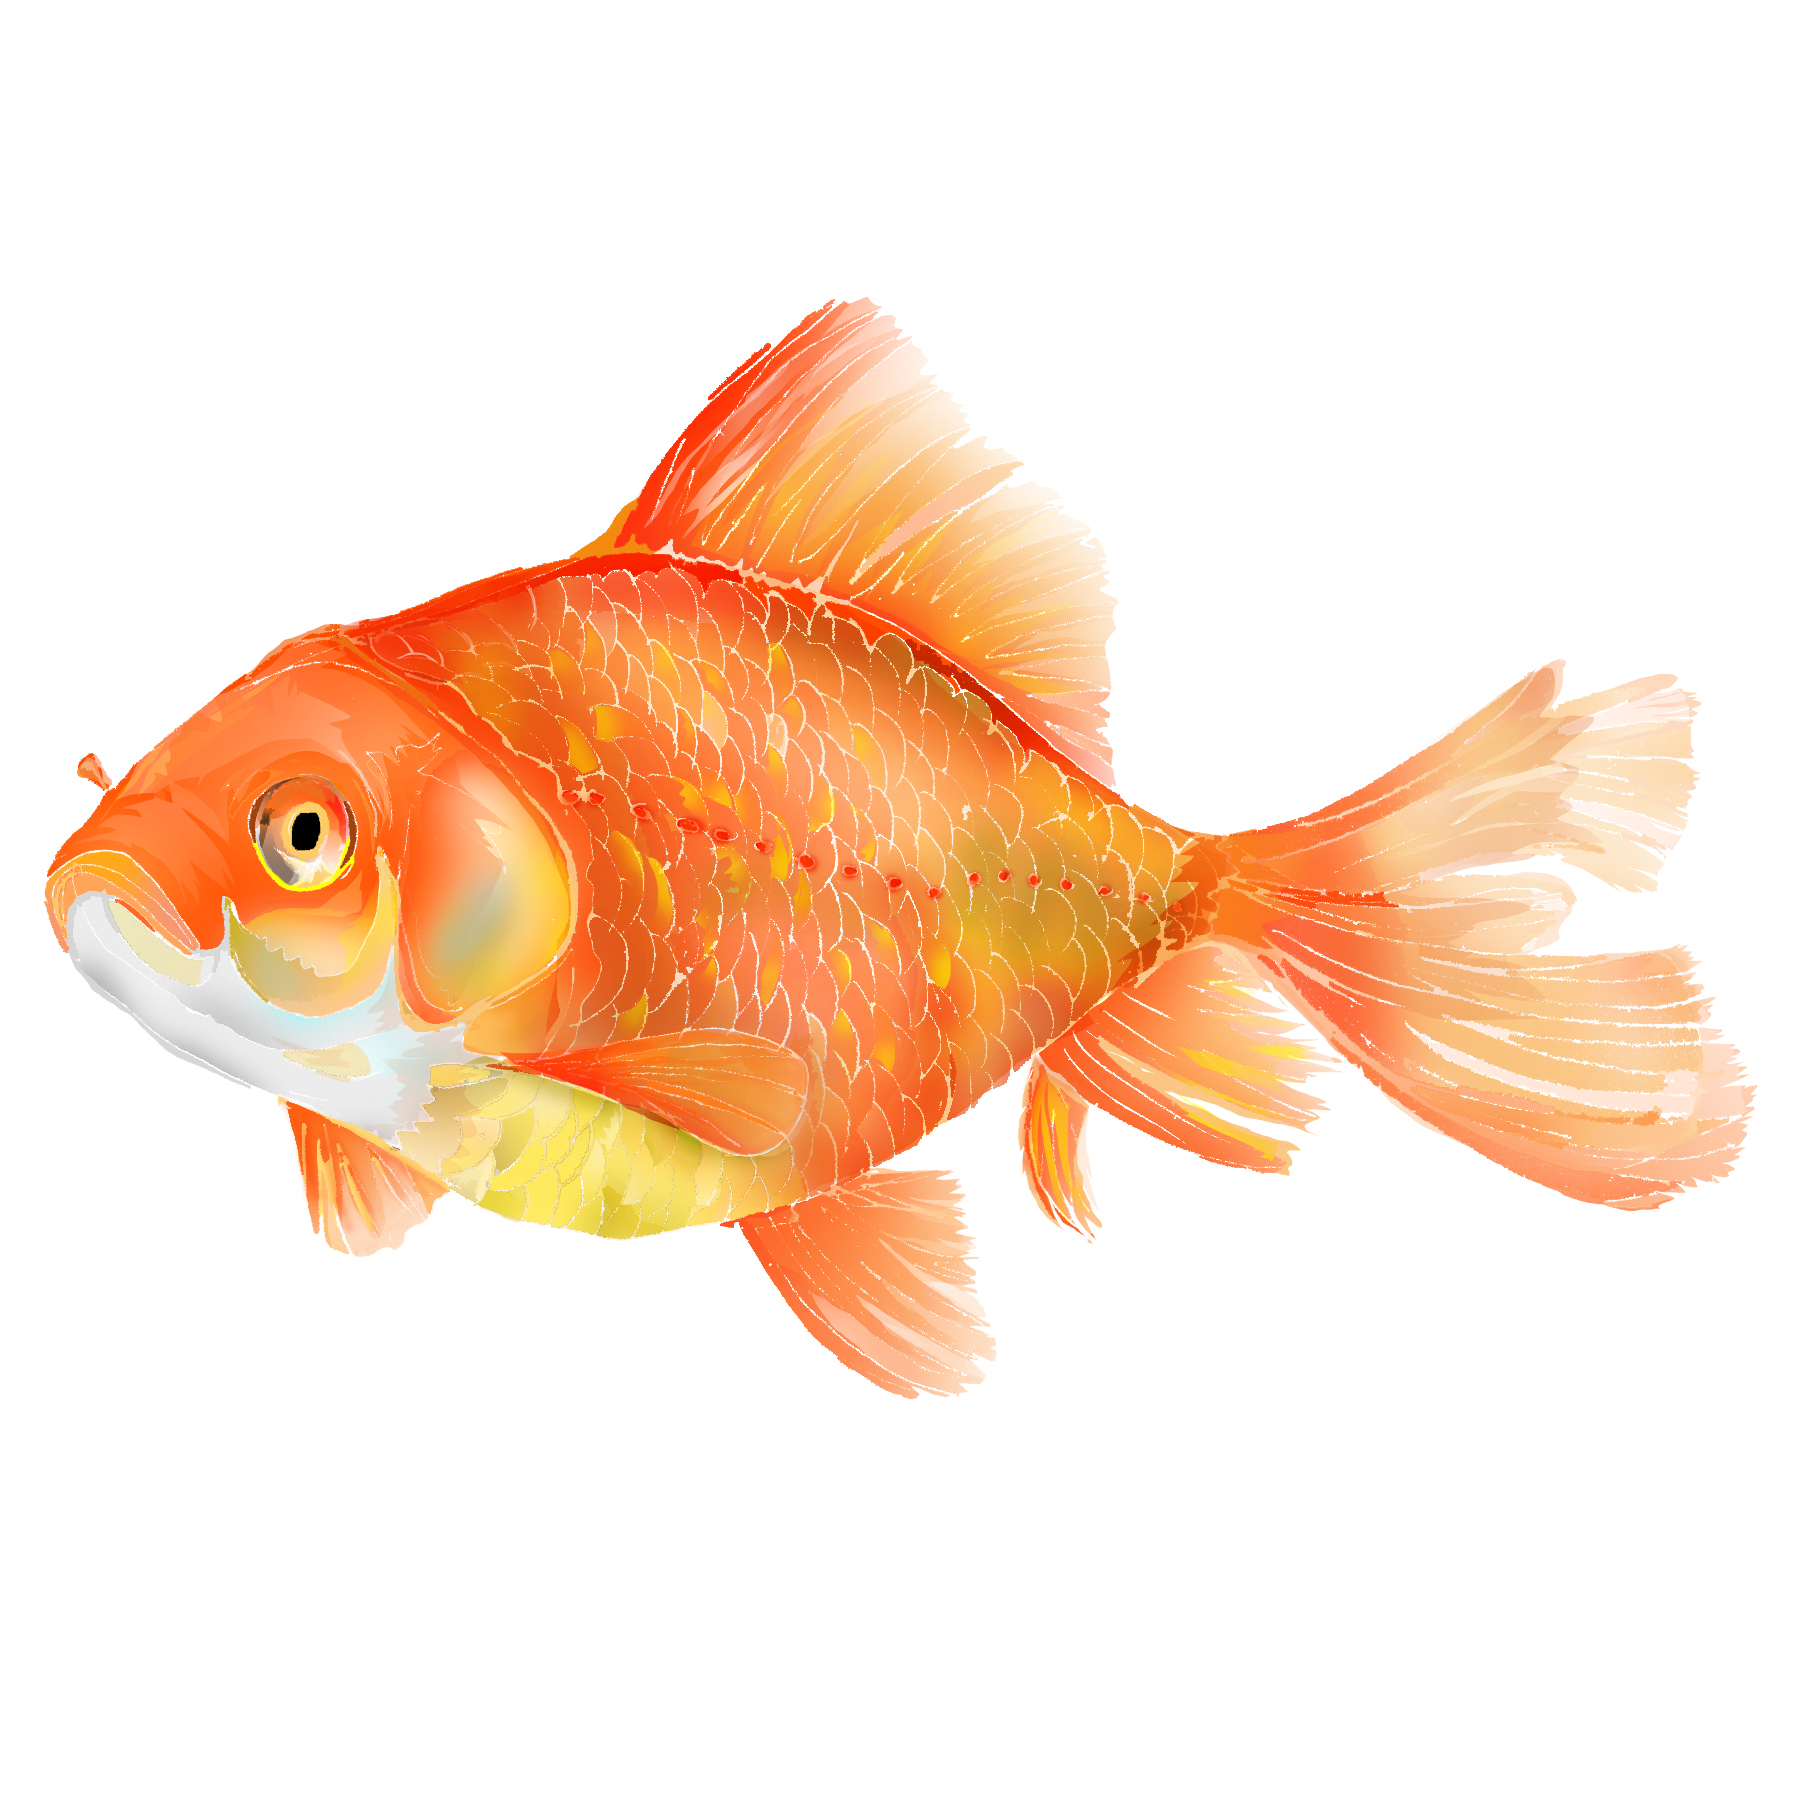 G - Goldfish